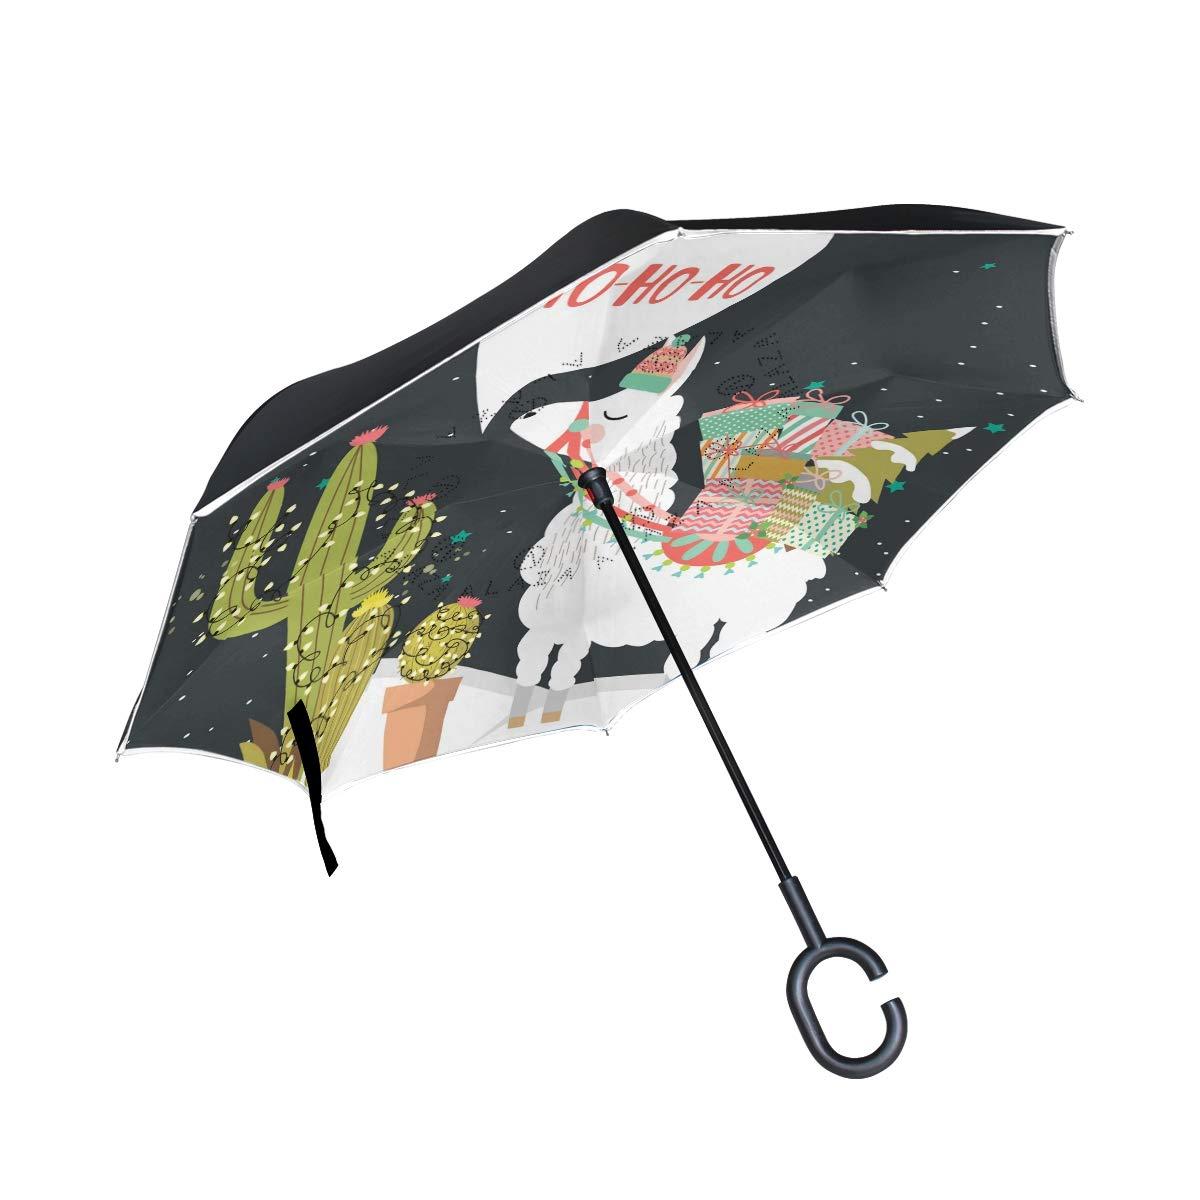 senya Saobao Double Layer Inverted Umbrella Fun Alpaca Reverse Folding Umbrella Windproof UV Rain for Outdoor with C-Shaped Handle